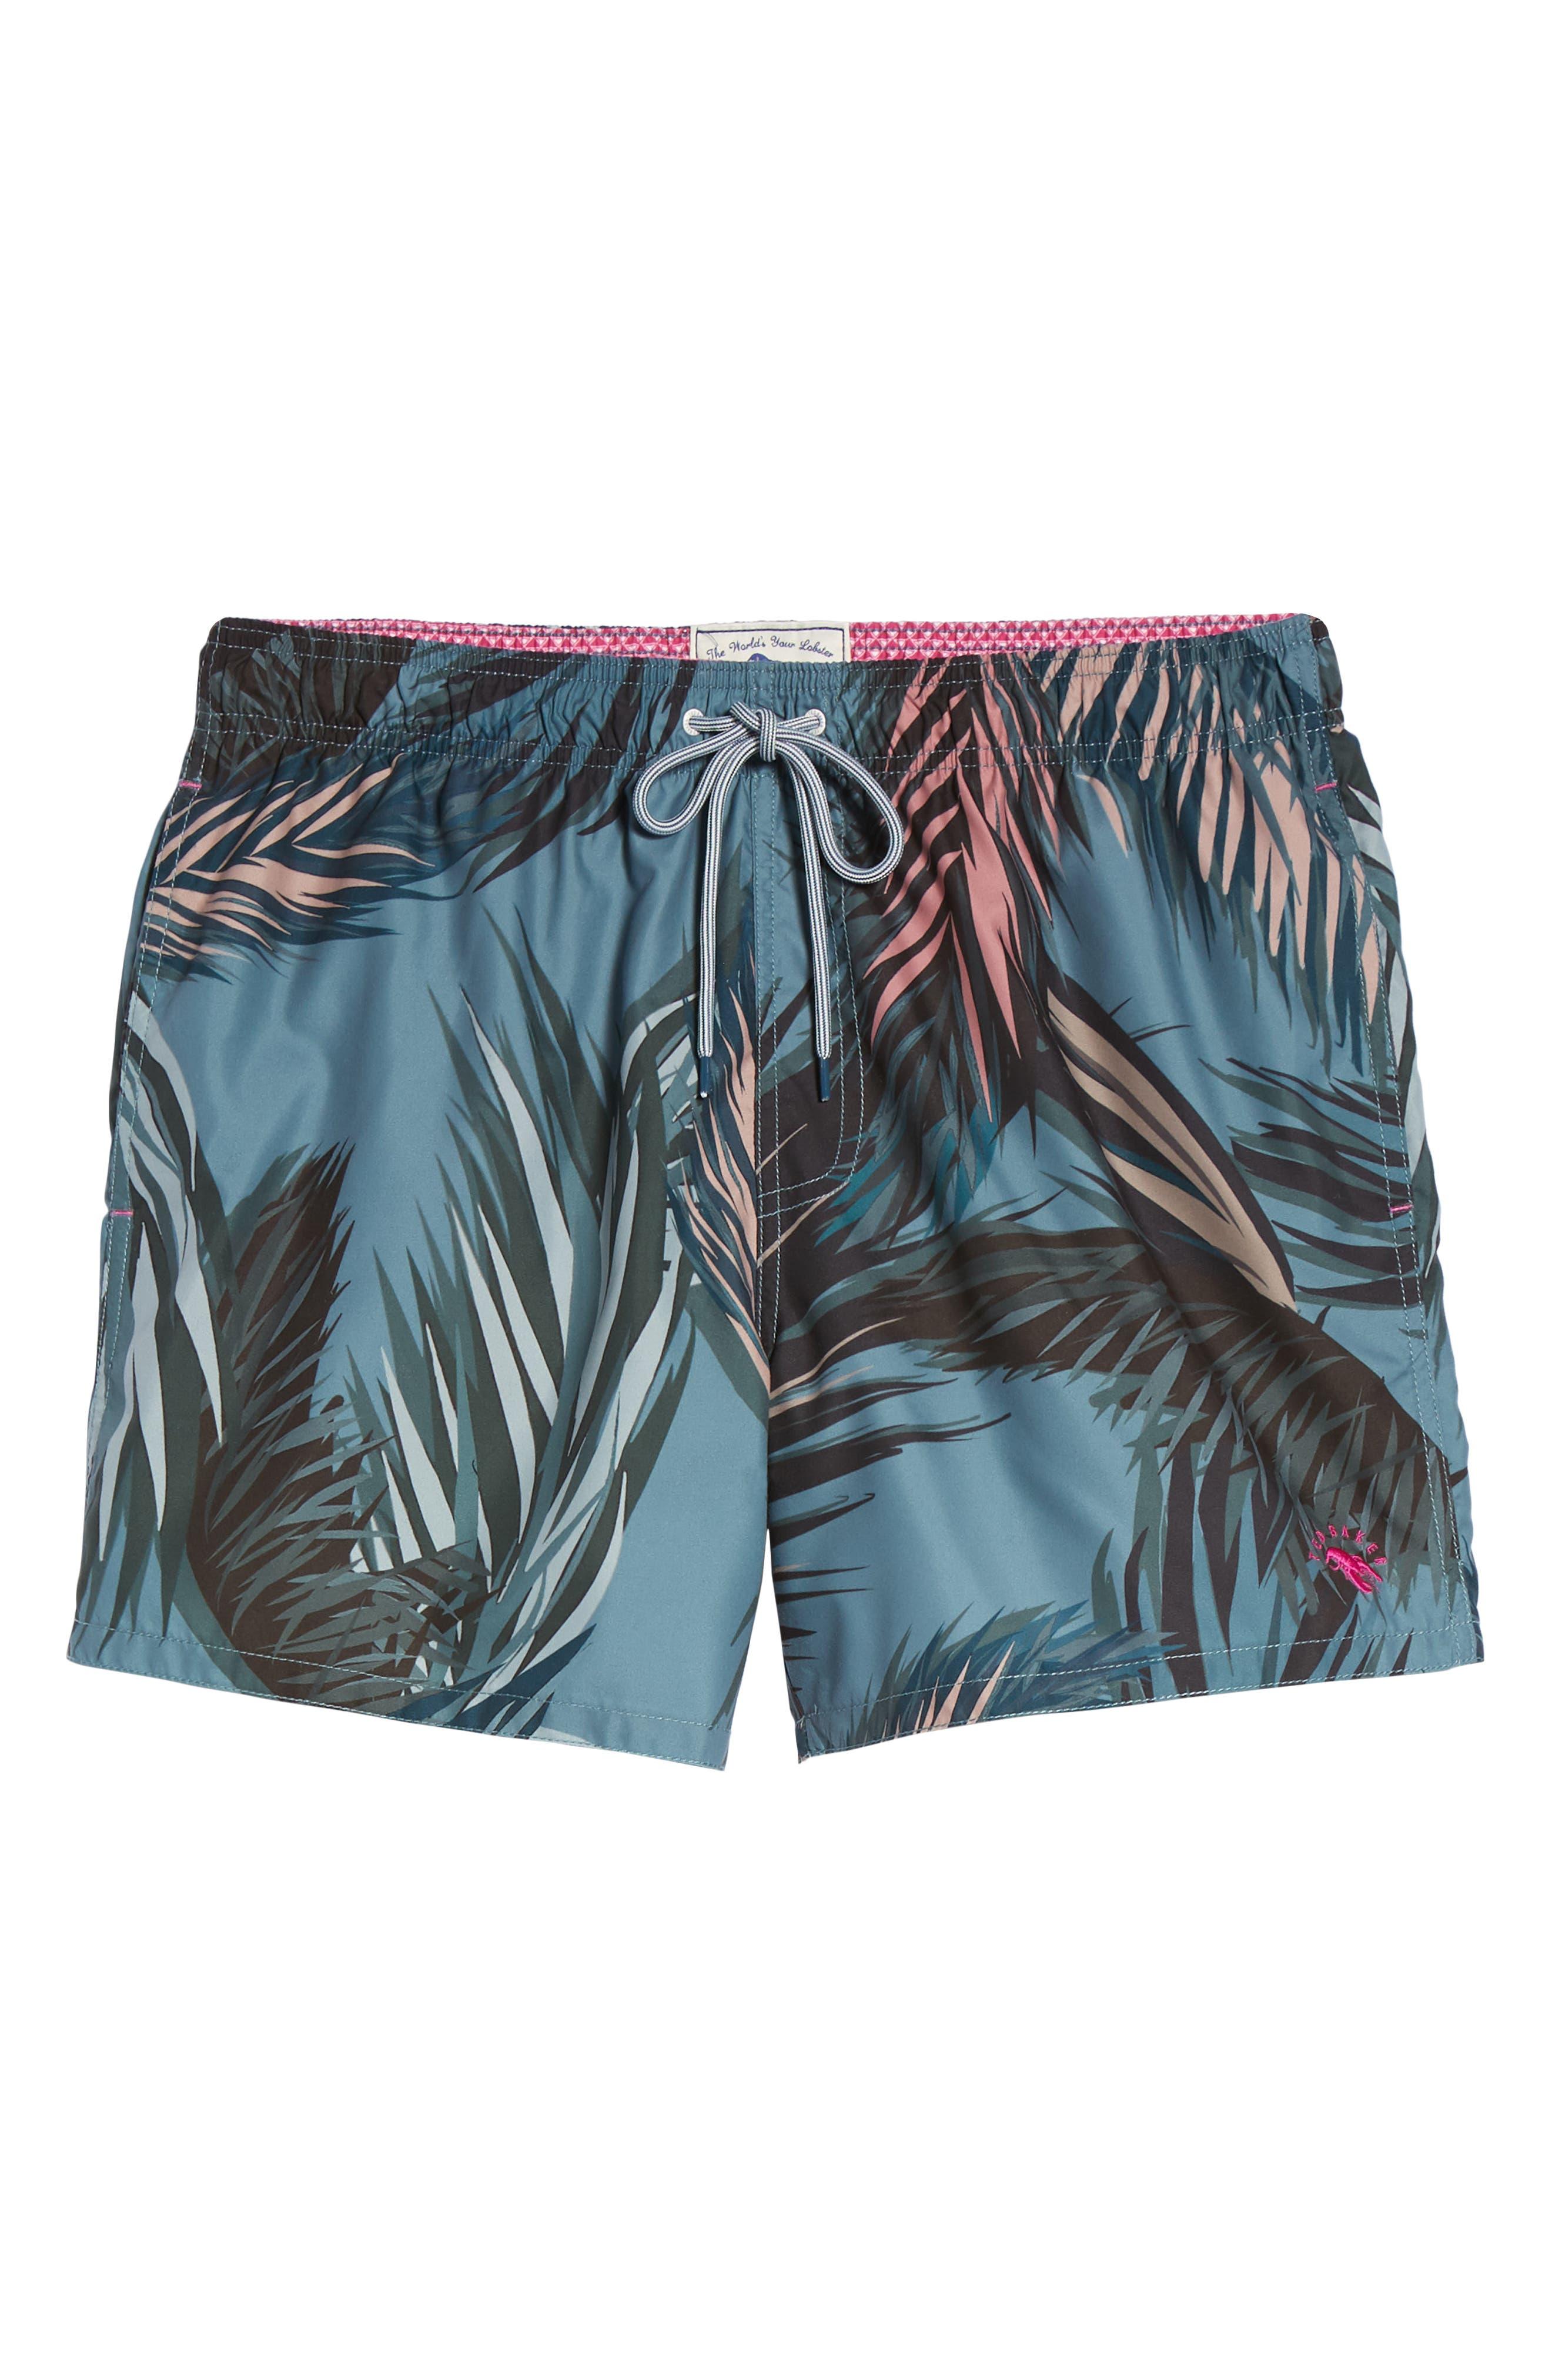 Raynebo Slim Fit Palm Leaf Swim Trunks,                             Alternate thumbnail 6, color,                             301